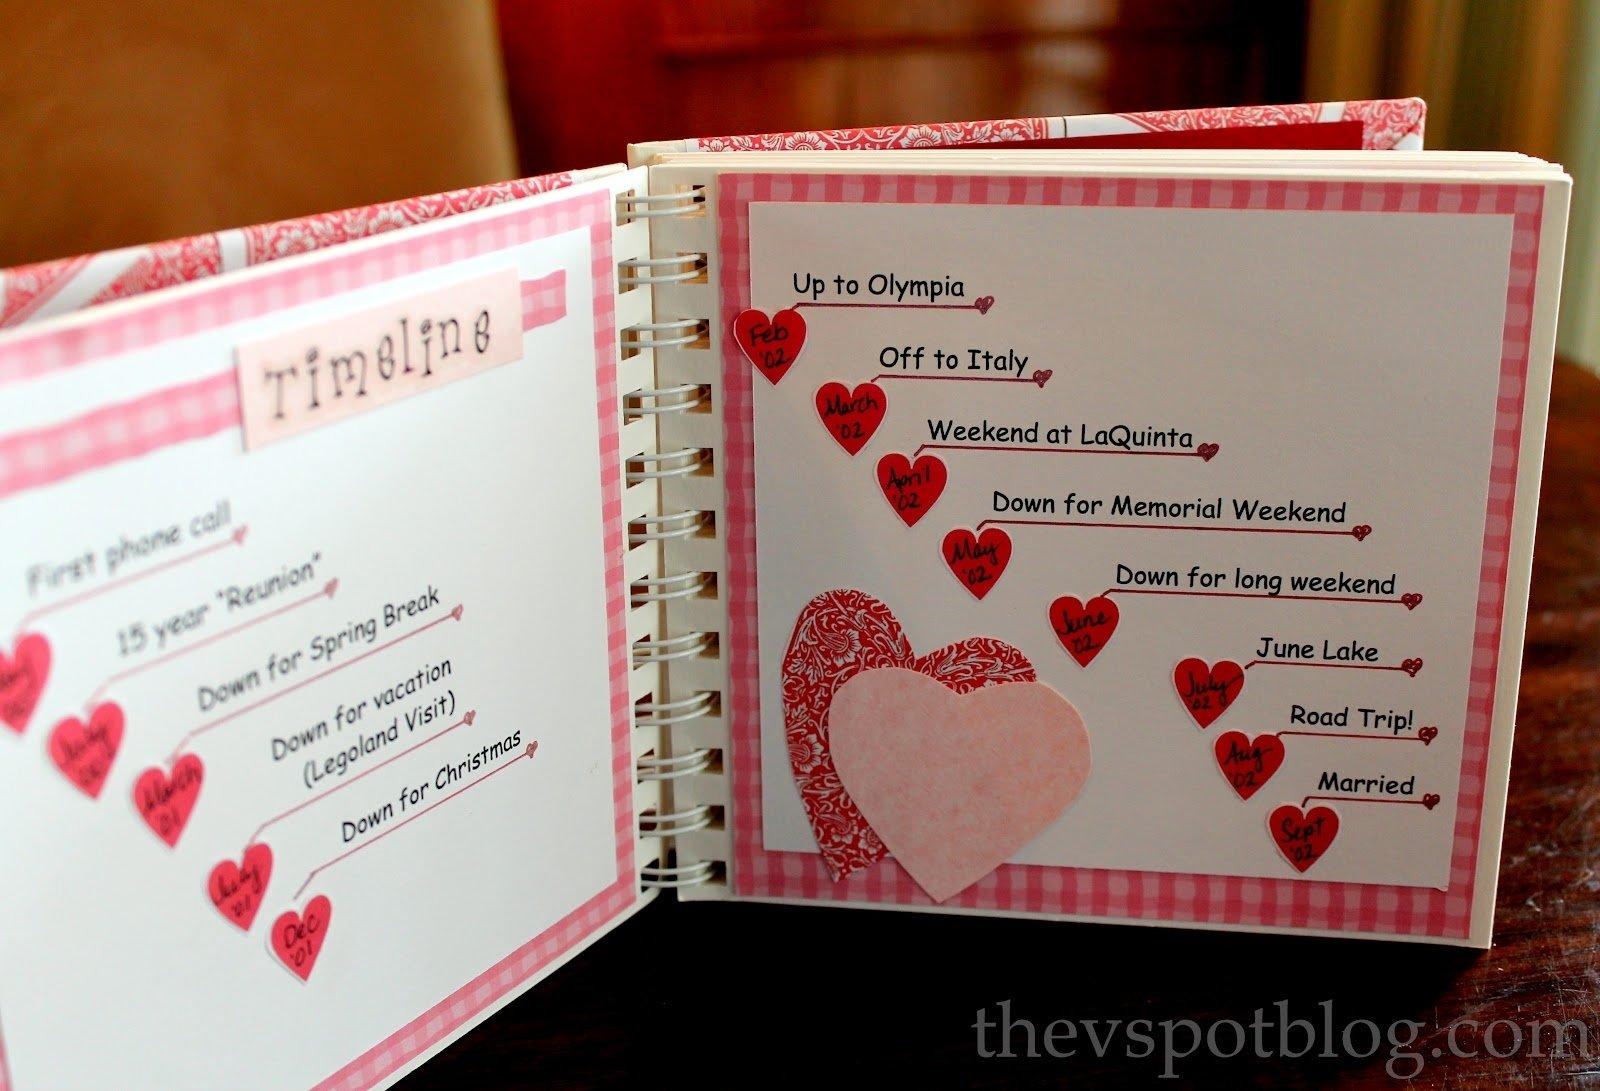 10 Stunning Homemade Valentines Day Ideas Him day gifts boyfriend homemade valentine new creative dma homes 89237 5 2020